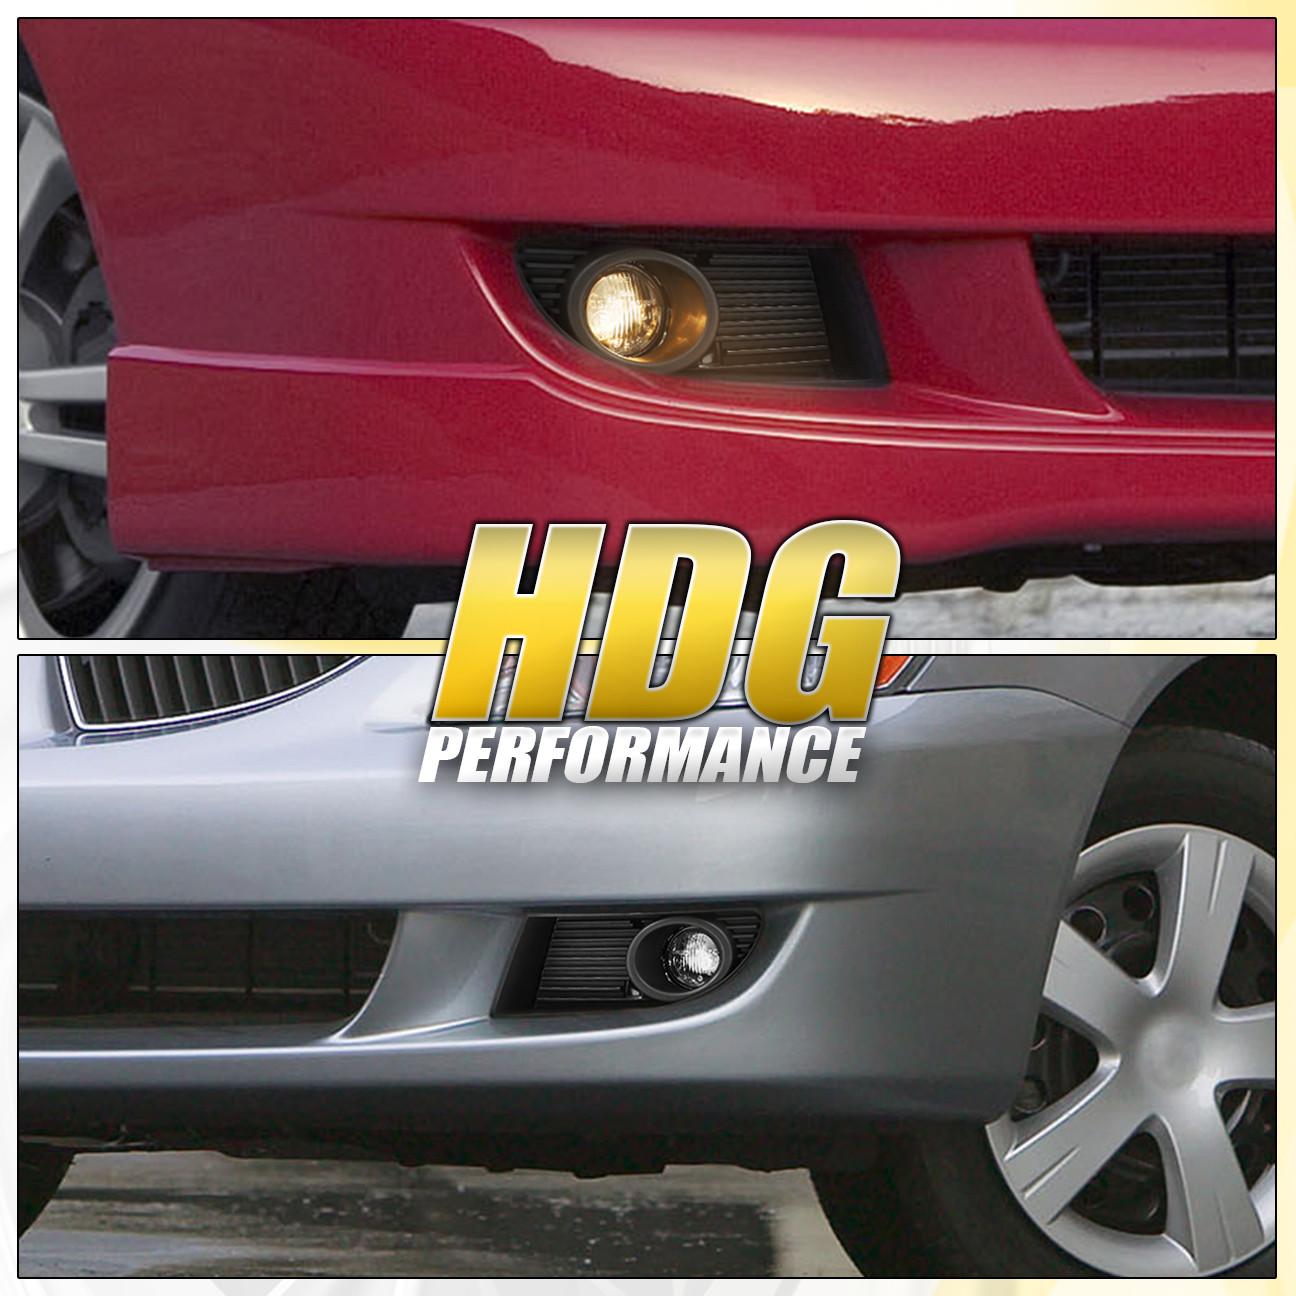 04-06 Mitsubishi Lancer Chrome Clear Driving JDM Bumper Fog Light Lamp Harness